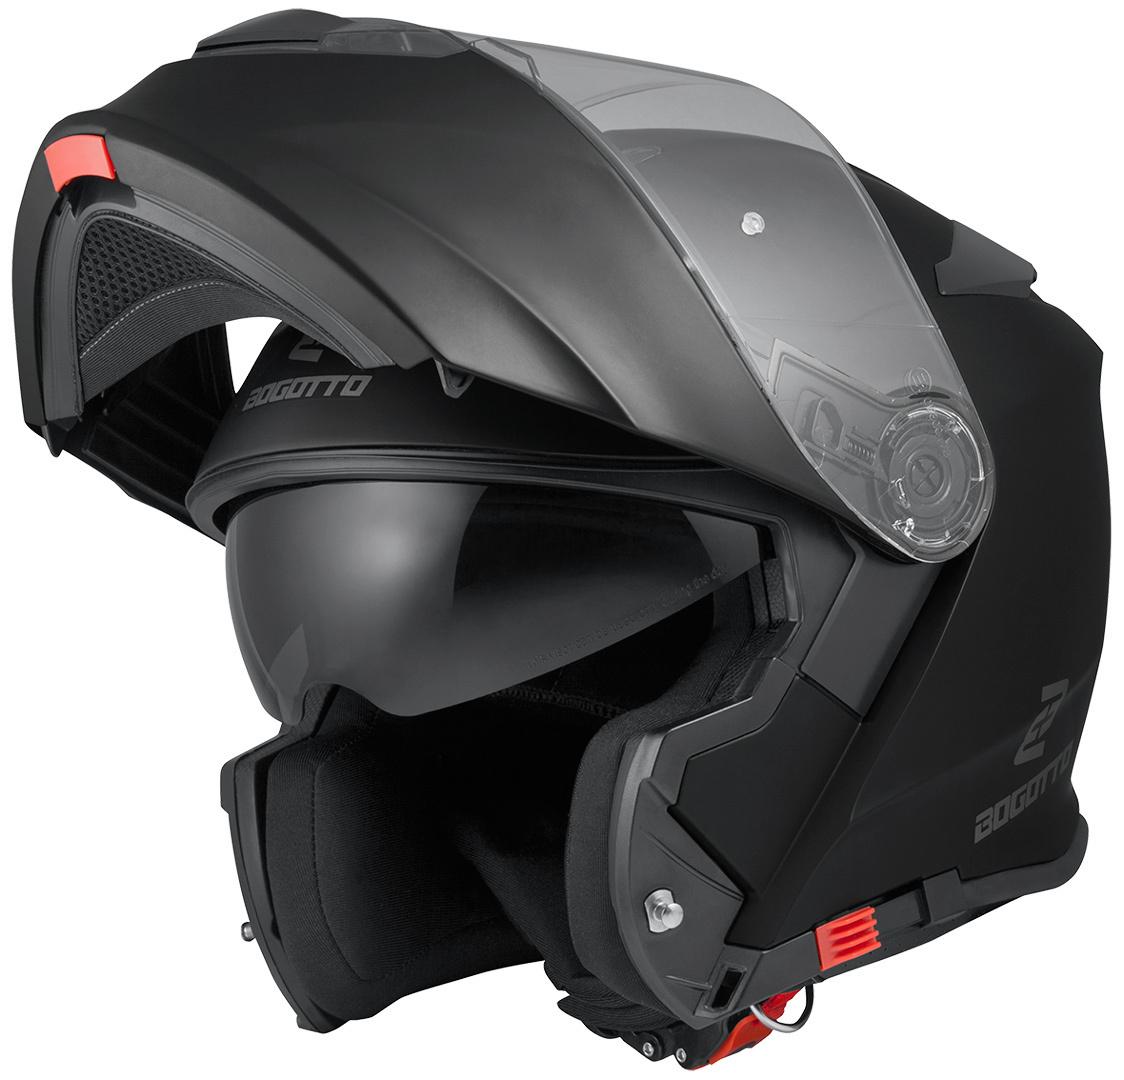 Bogotto V271 Motorrad Klapphelm, schwarz, Größe L, schwarz, Größe L